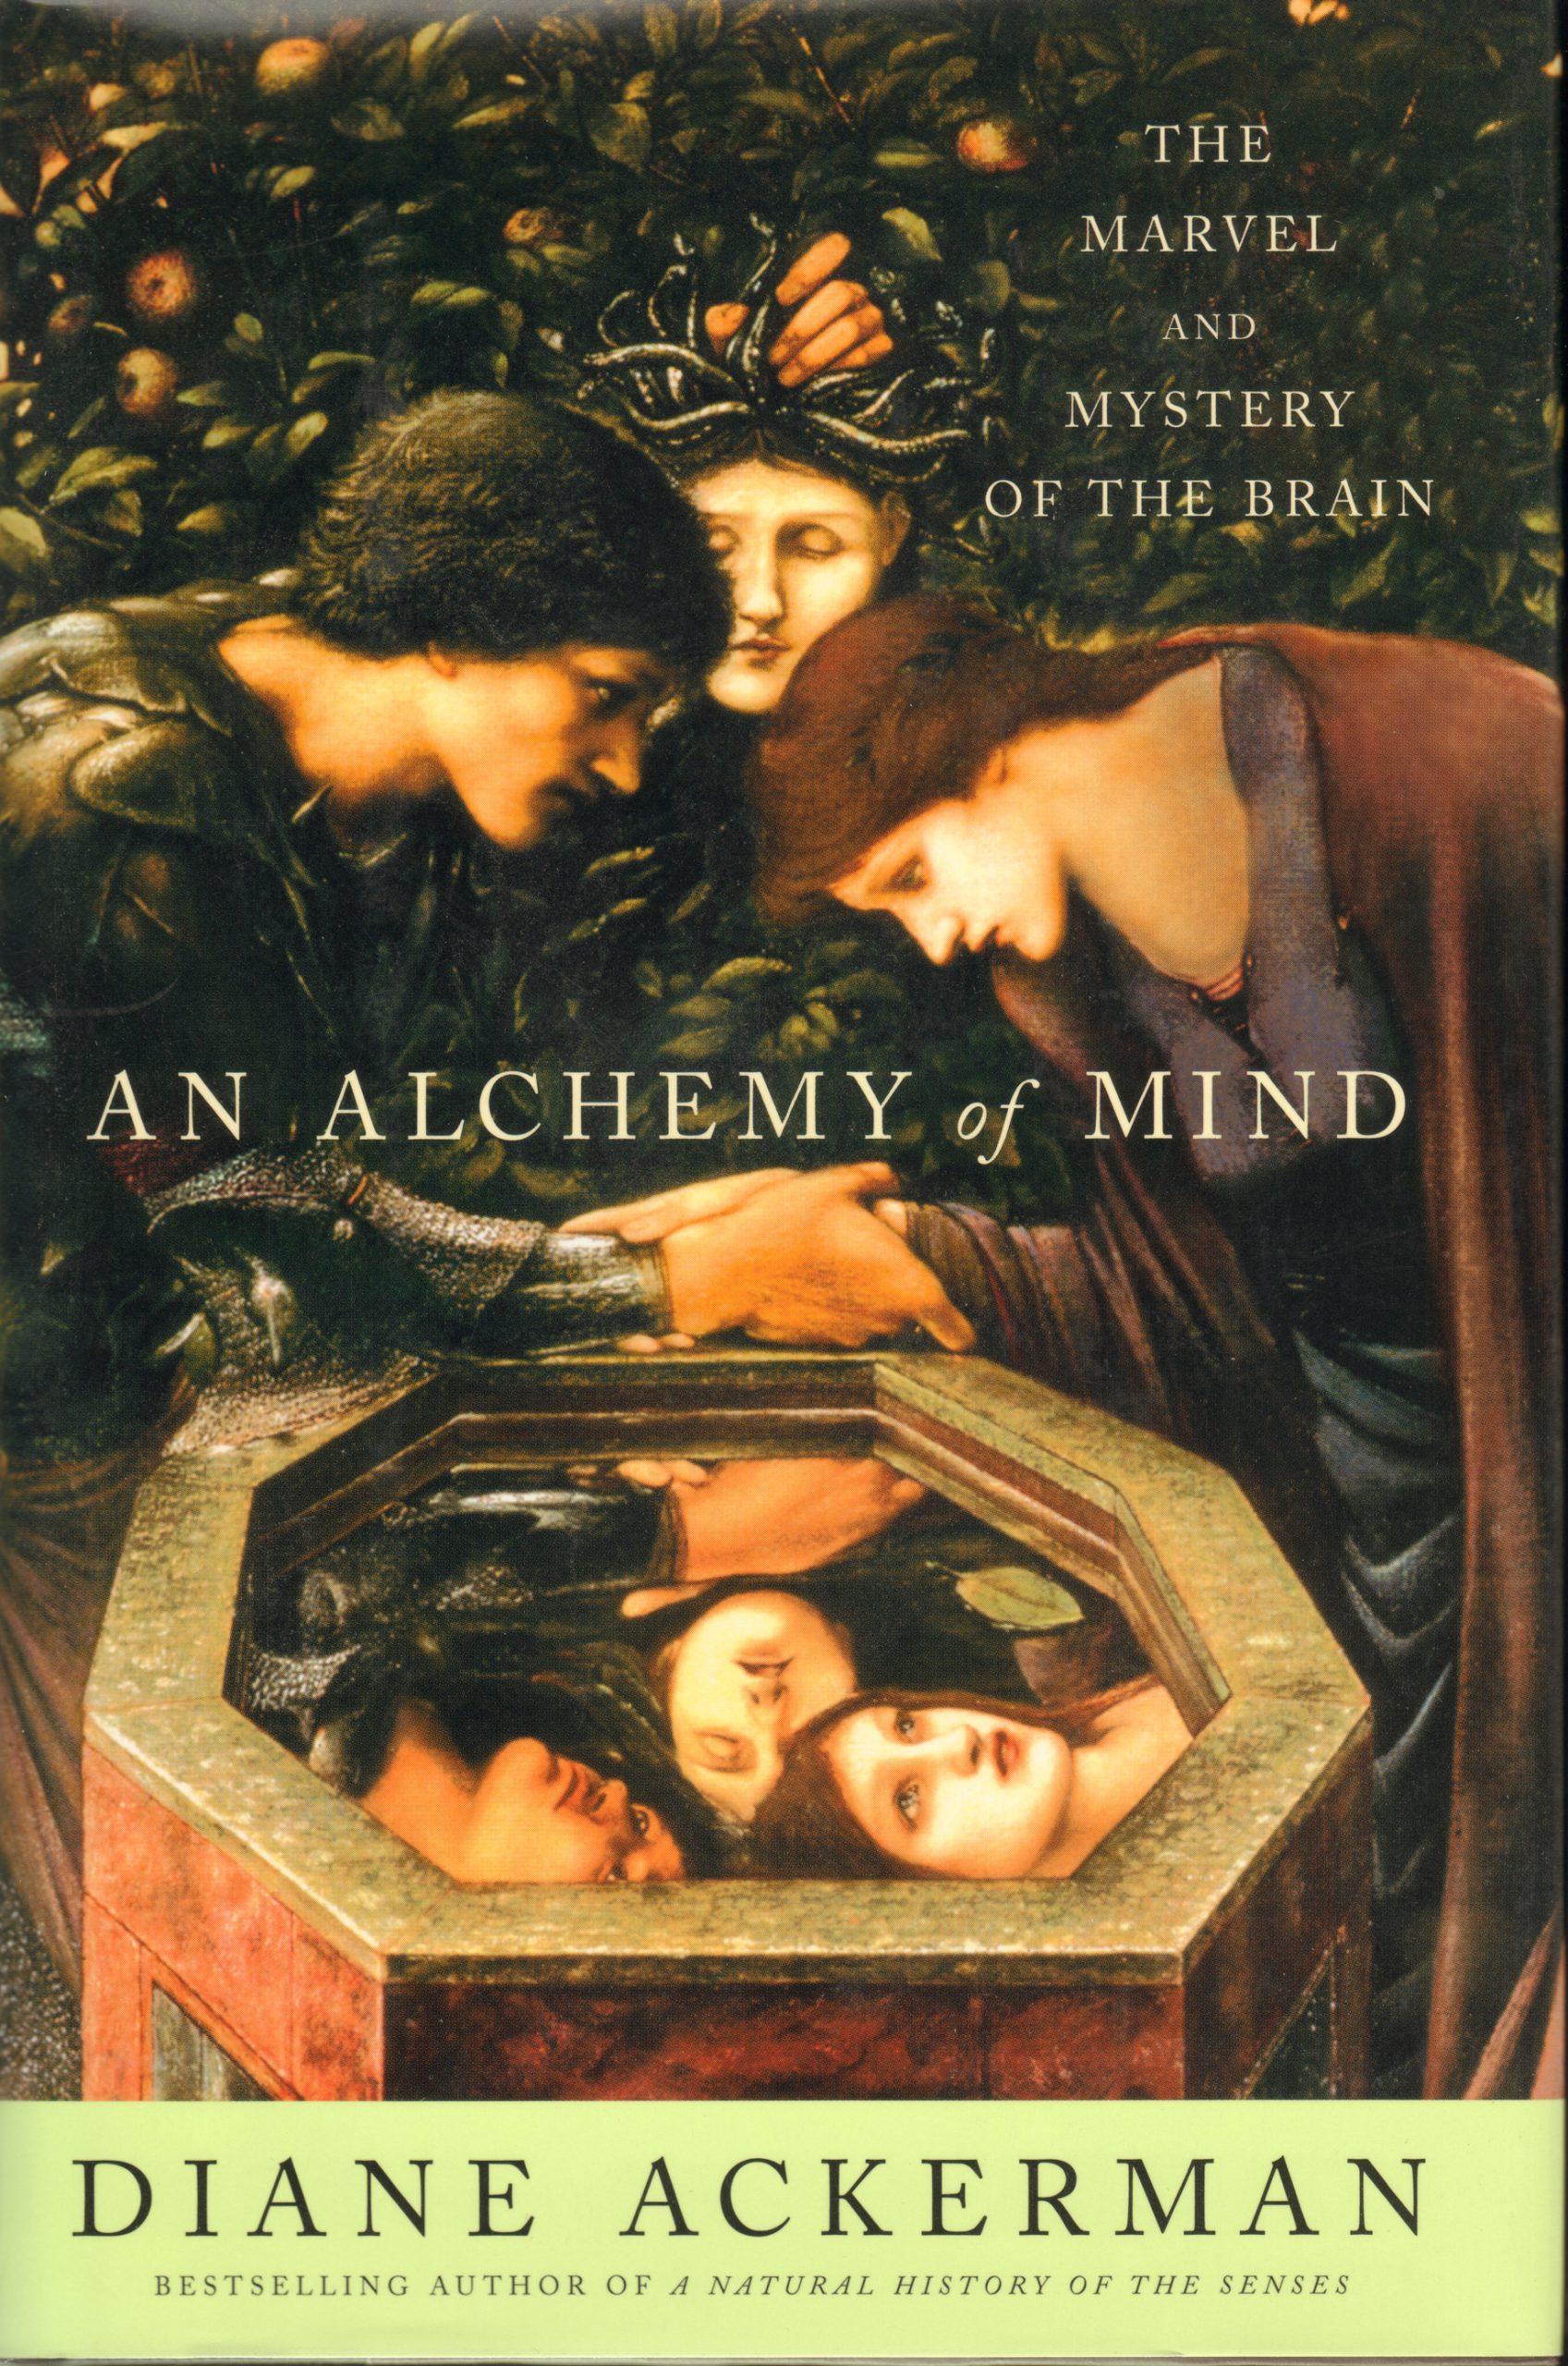 An Alchemy of Mind by Diane Ackerman